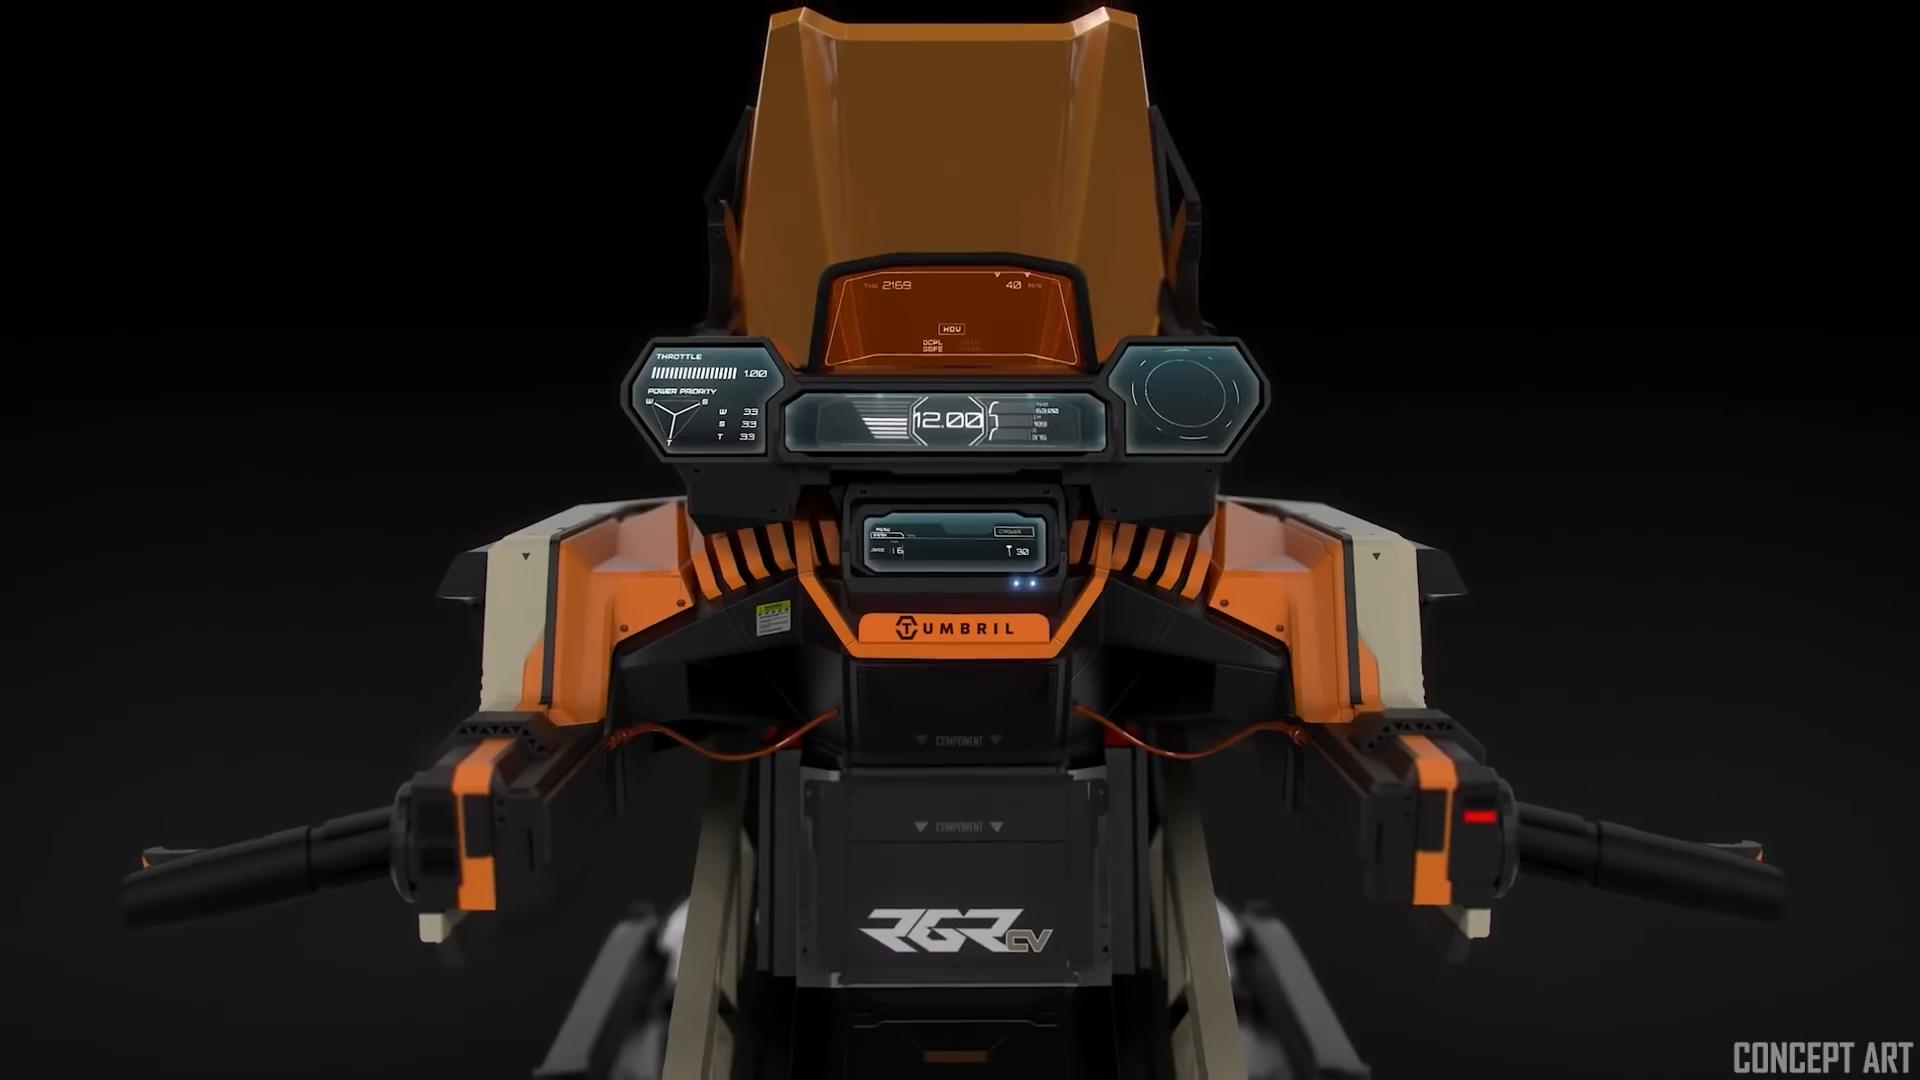 Tumbril Ranger - Kierownica